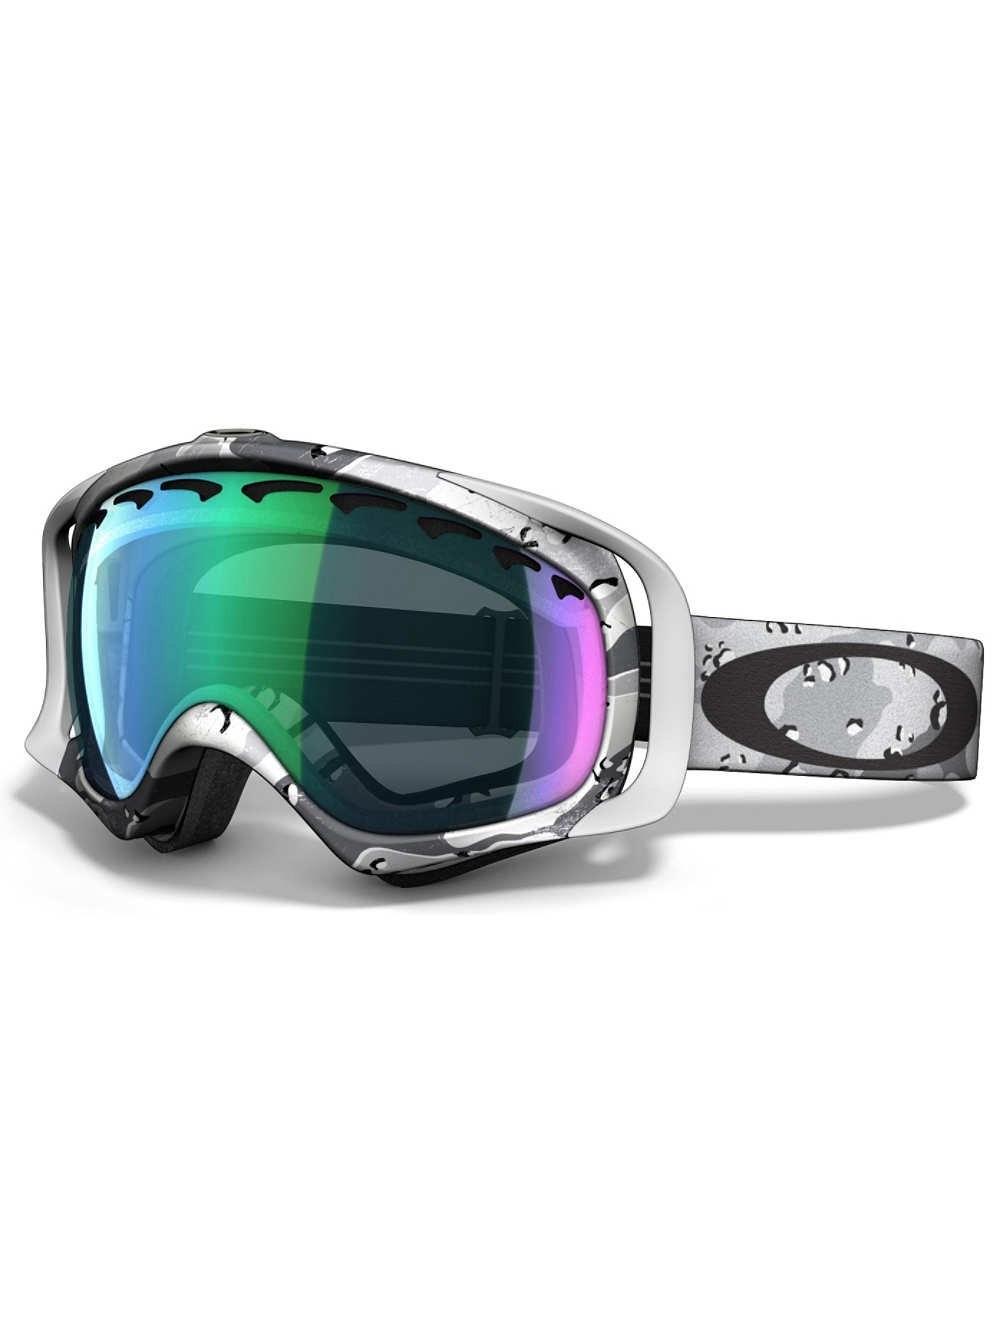 oakley crowbar snowboard ski goggles activelifestore